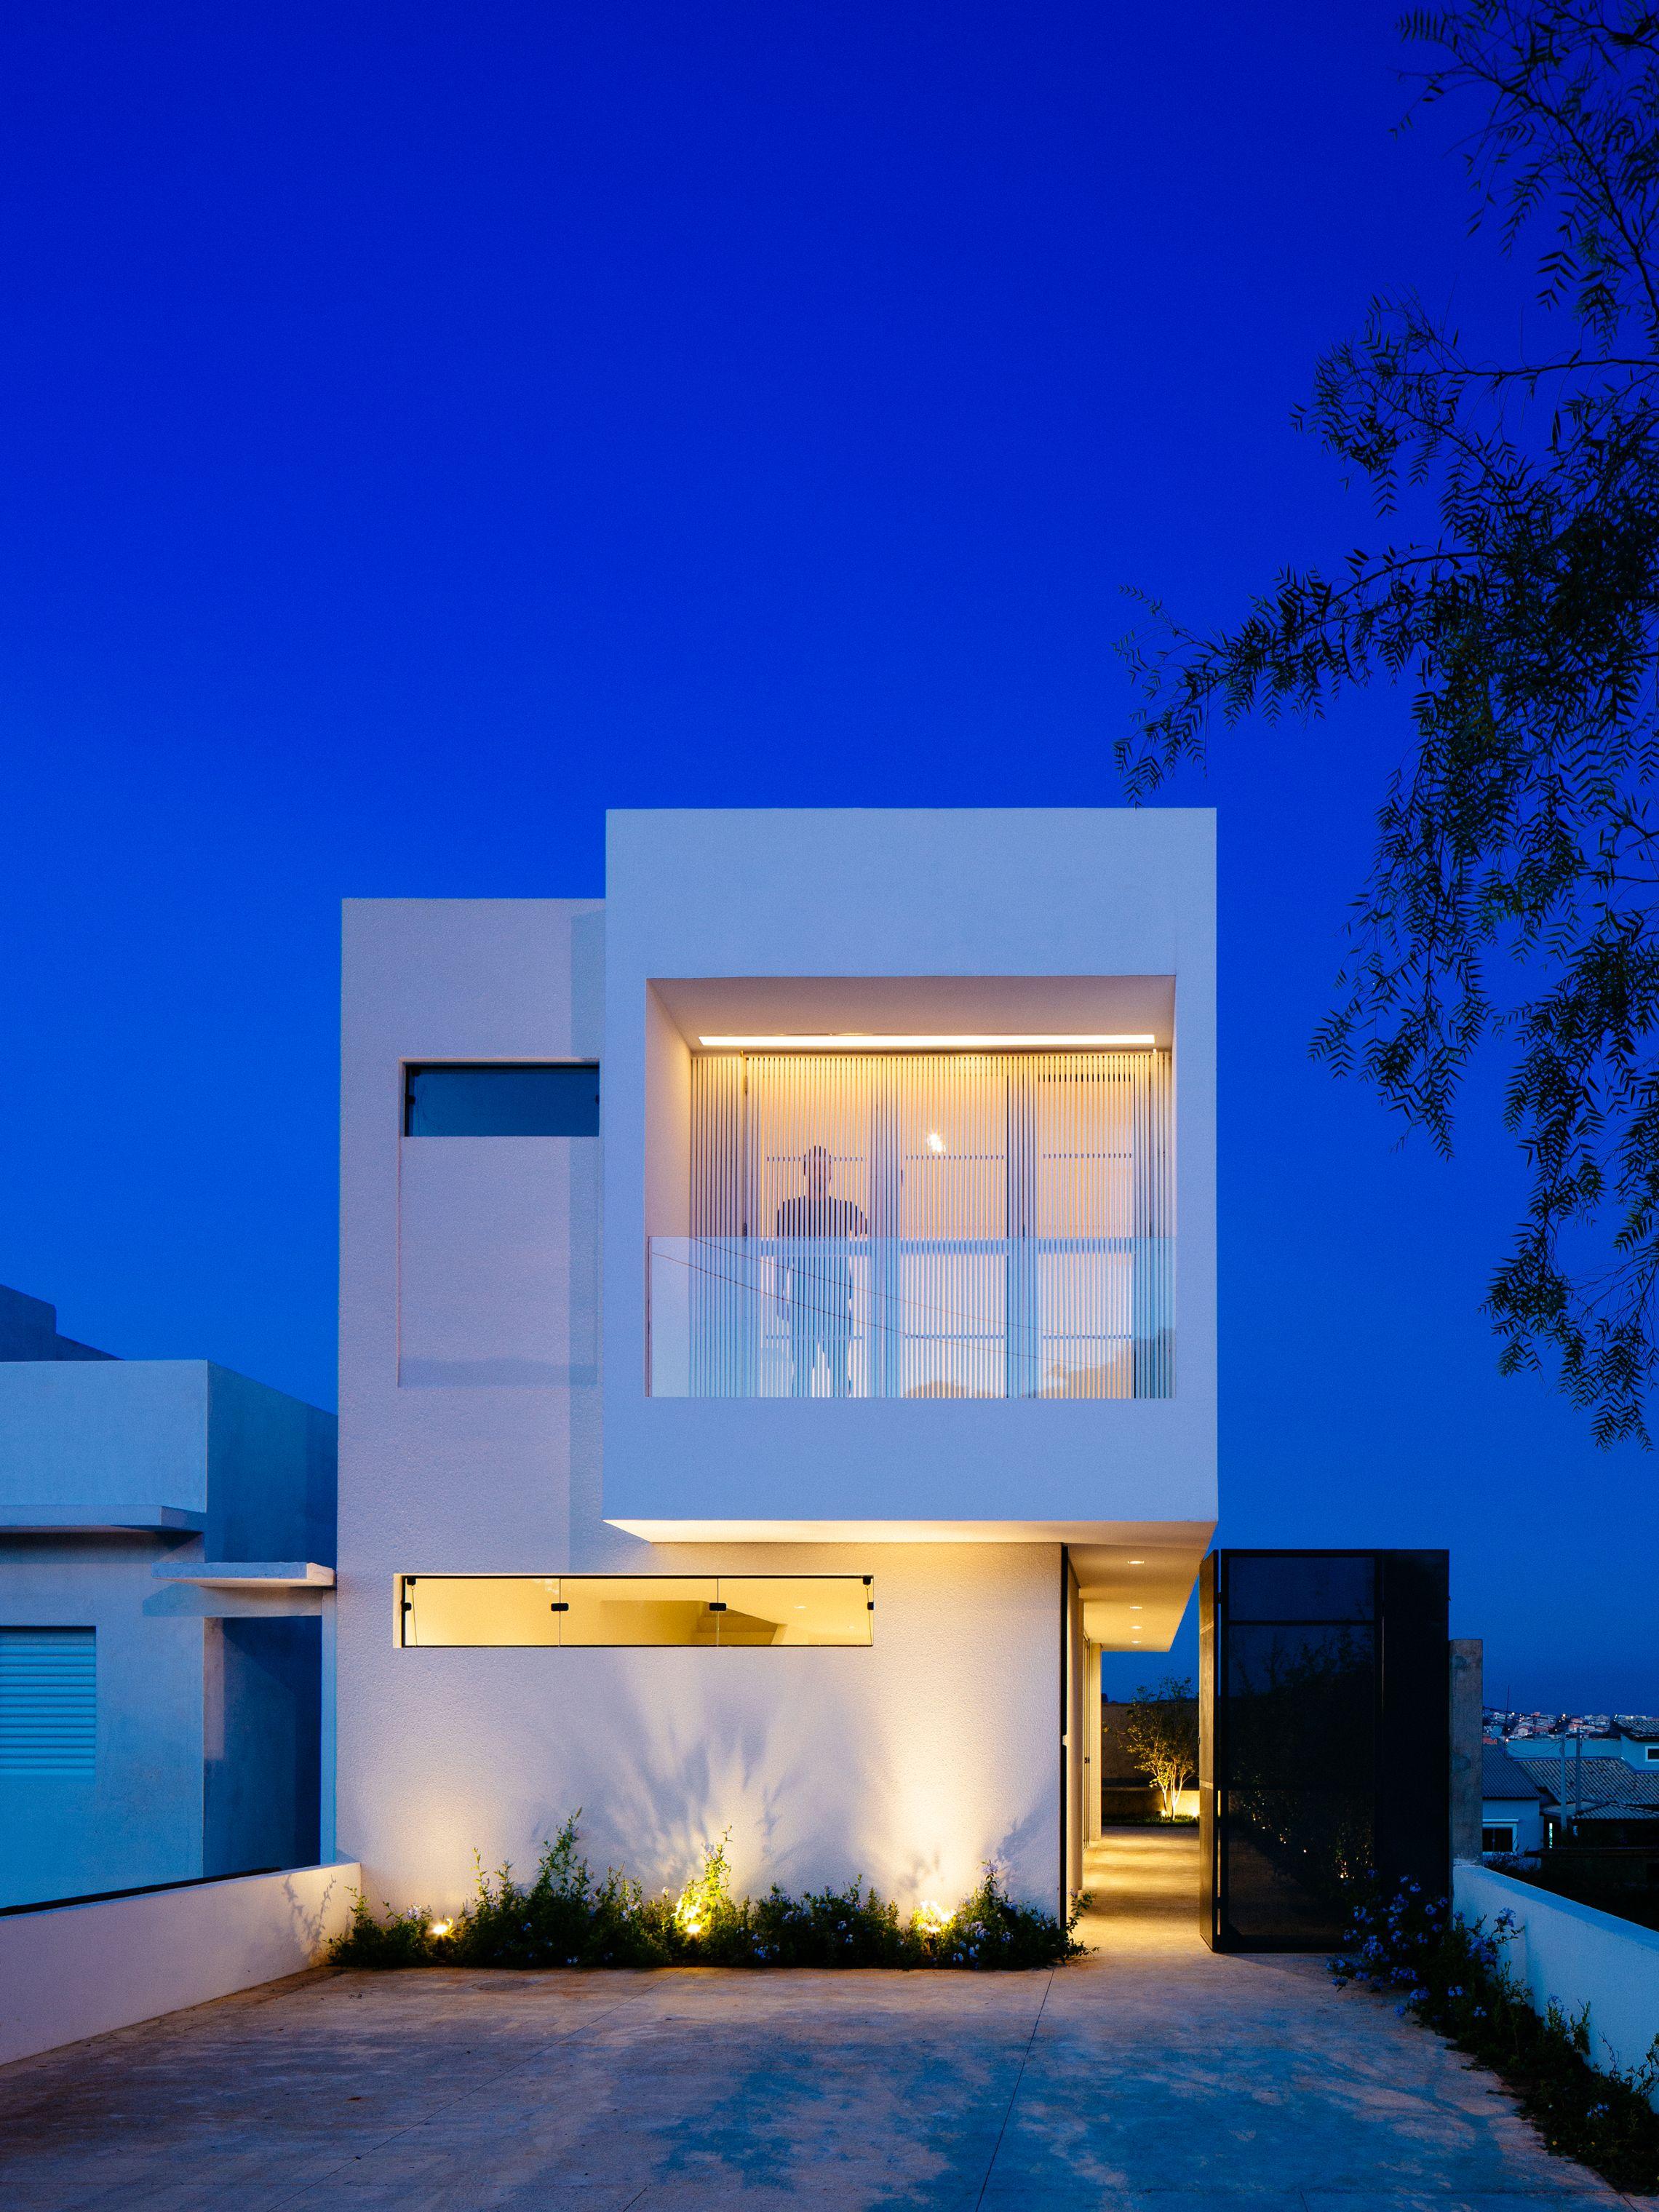 Sencilla casa de dos pisos construida en terreno peque o for Pisos para casas minimalistas